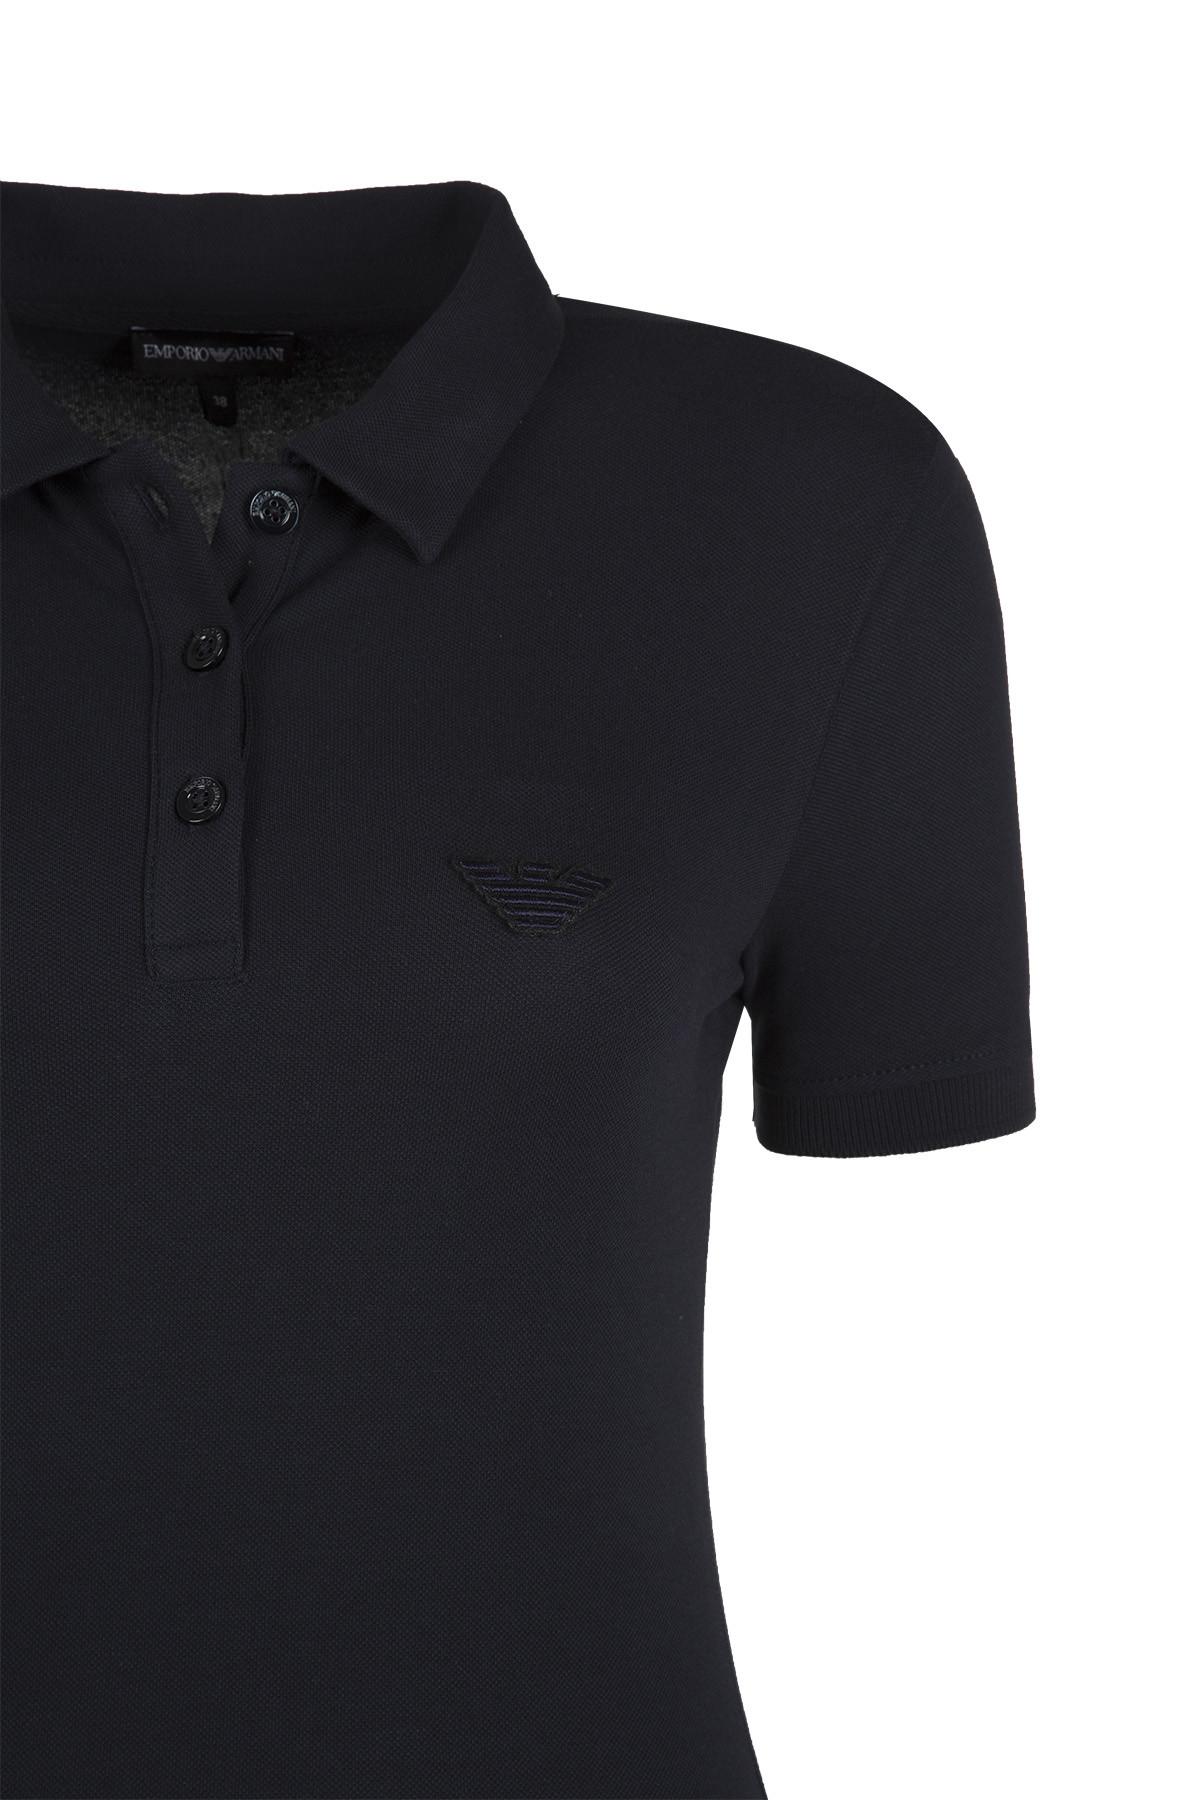 Emporio Armani Kadın Lacivert T-Shirt 3Z2M66 2J03Z 0920 2